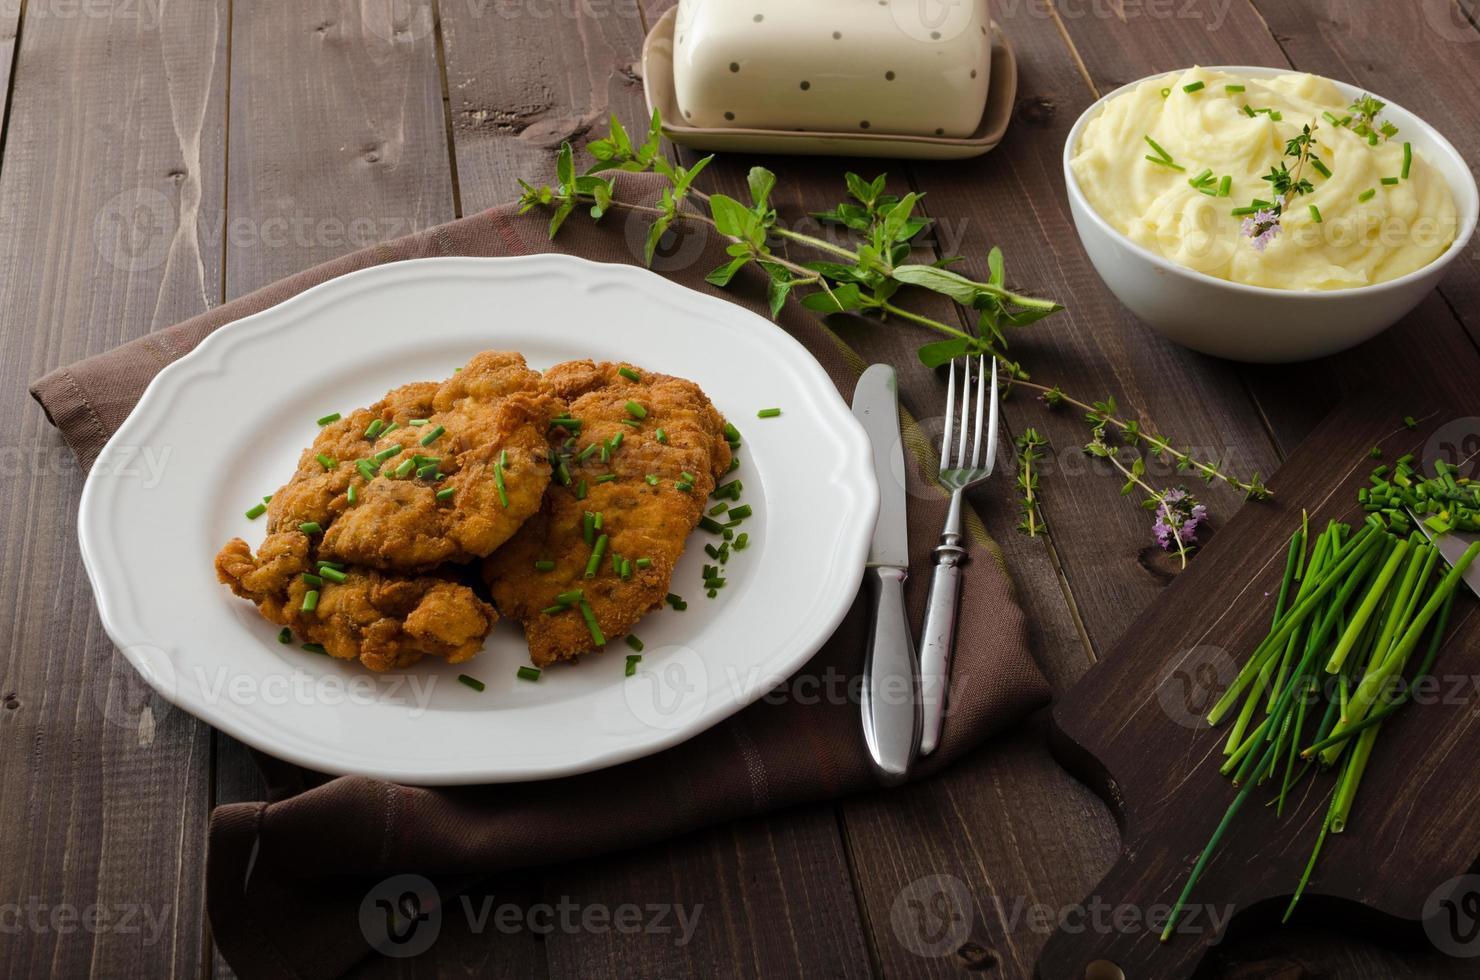 Schnitzel with herbs, photo